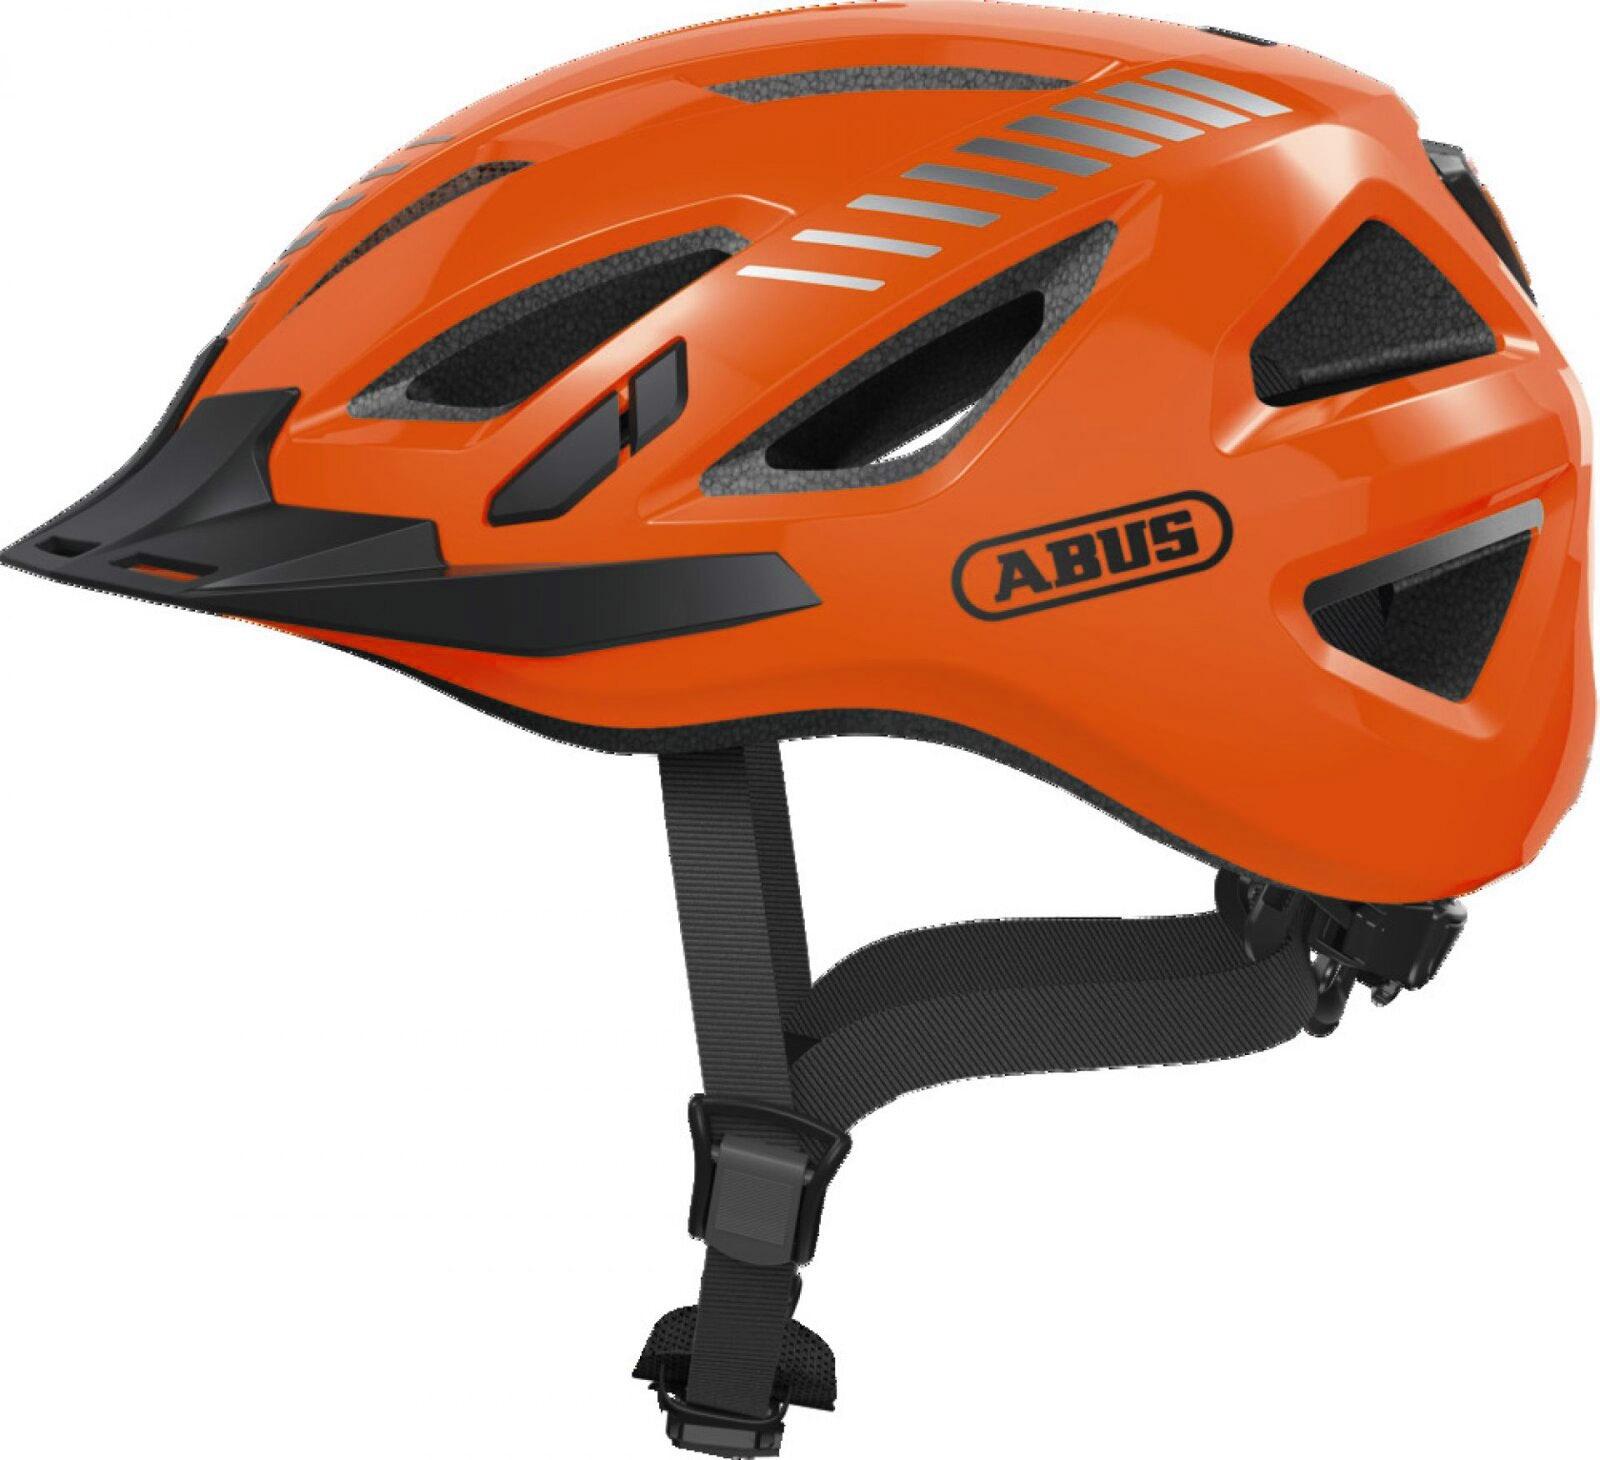 Abus Abus Urban-I 3.0 Signal M. Led - Orange Beklædning > Cykelhjelme > Cykelhjelme Med Lys